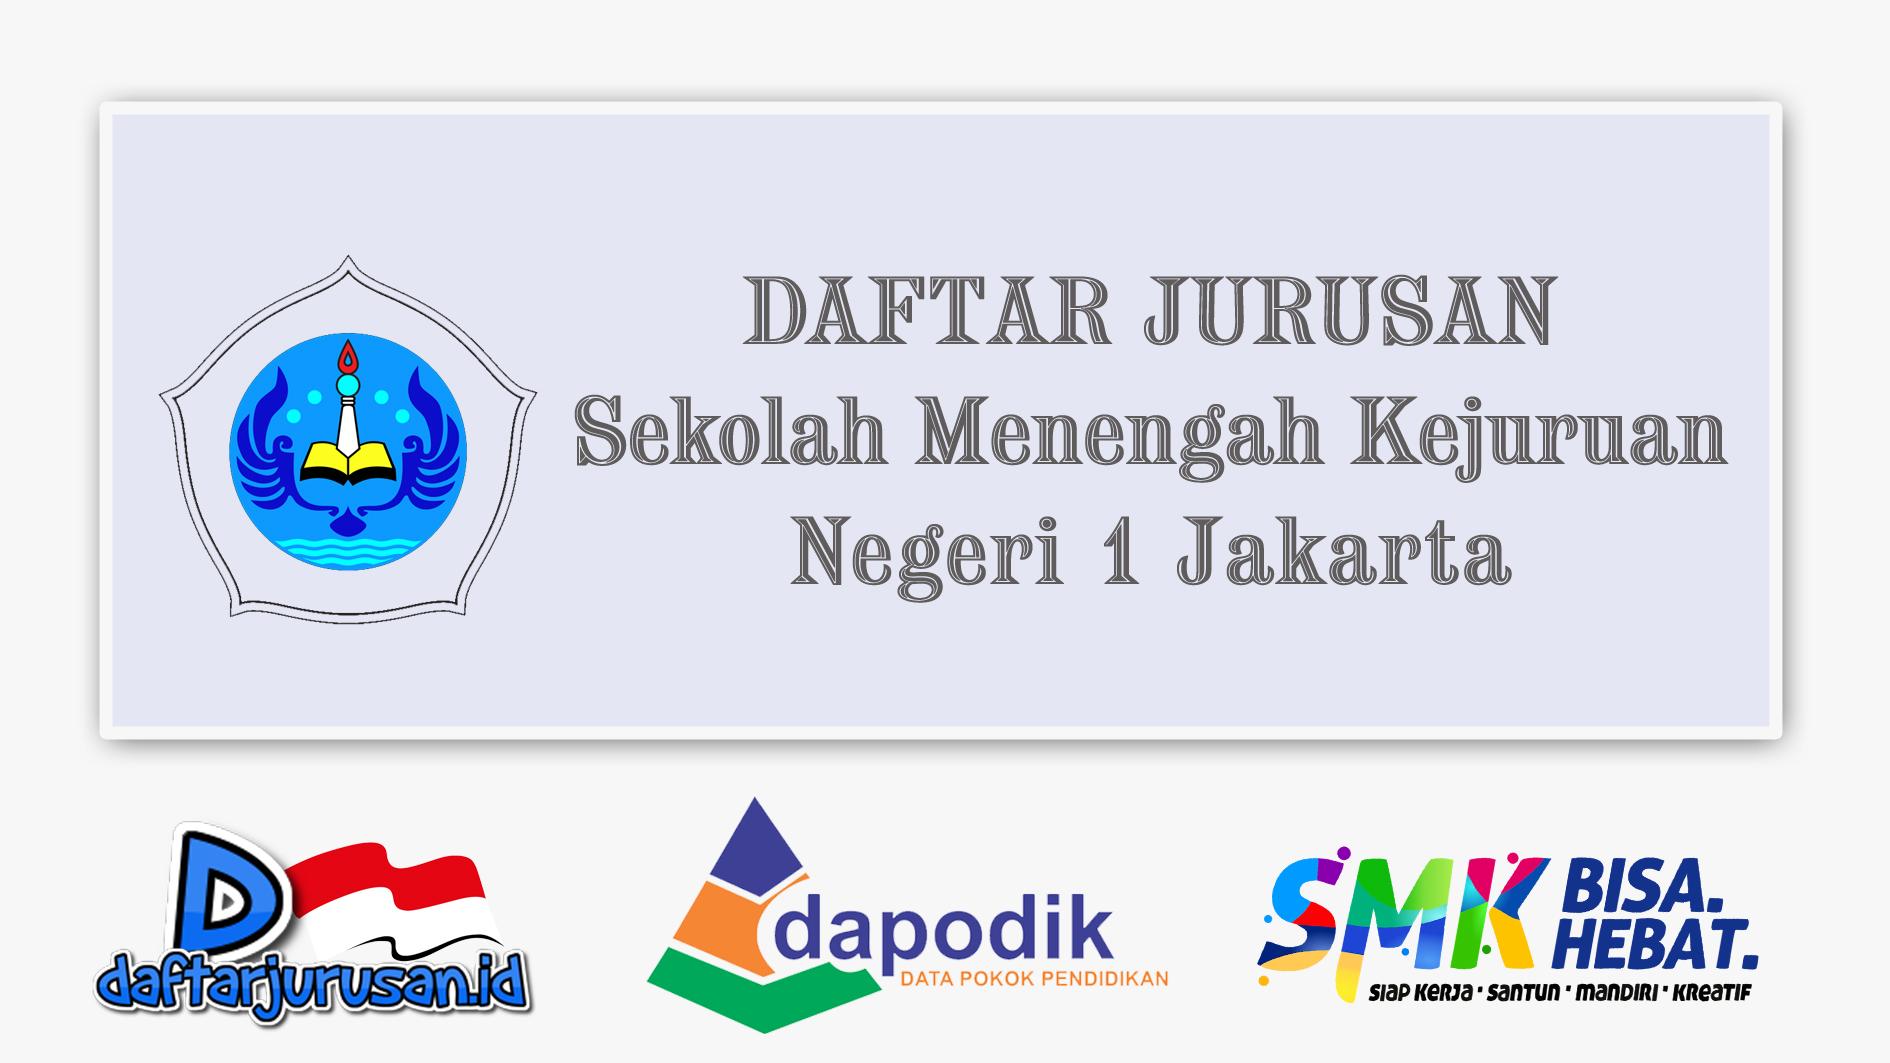 Daftar Jurusan SMK Negeri 1 Jakarta Pusat